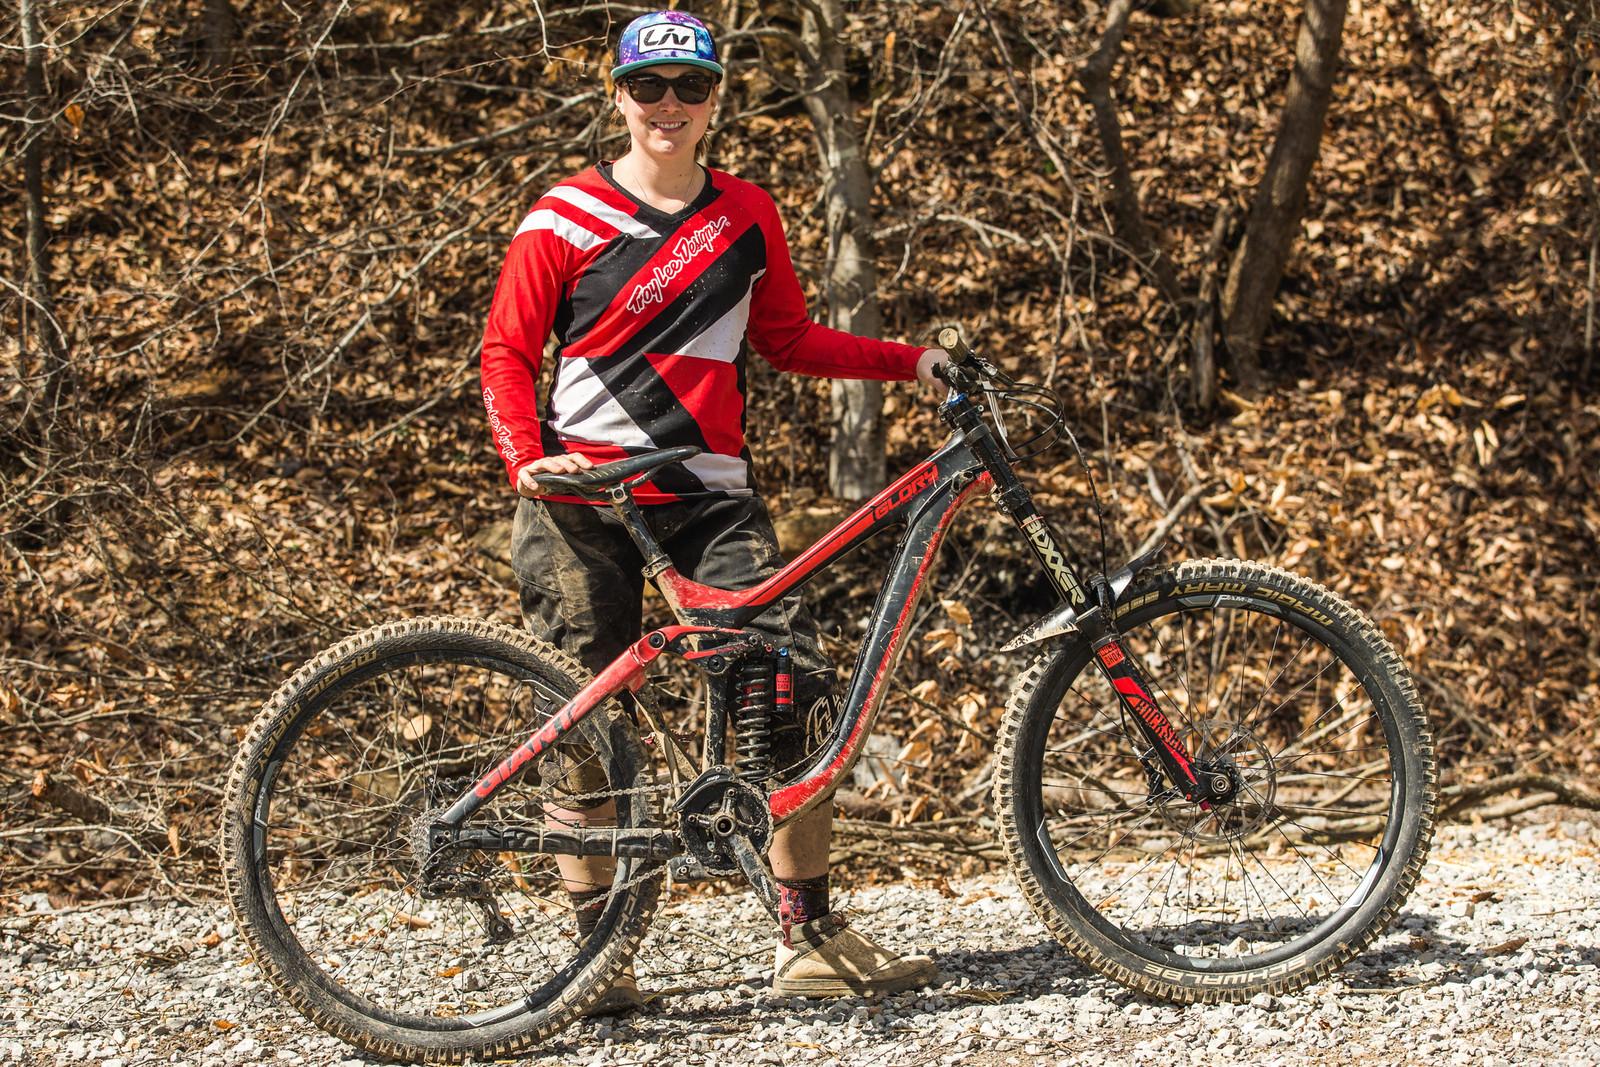 Pro GRT Pro Bike - Caroline Washam's Giant Glory Advanced - Pro Bikes from Windrock Pro GRT - Mountain Biking Pictures - Vital MTB